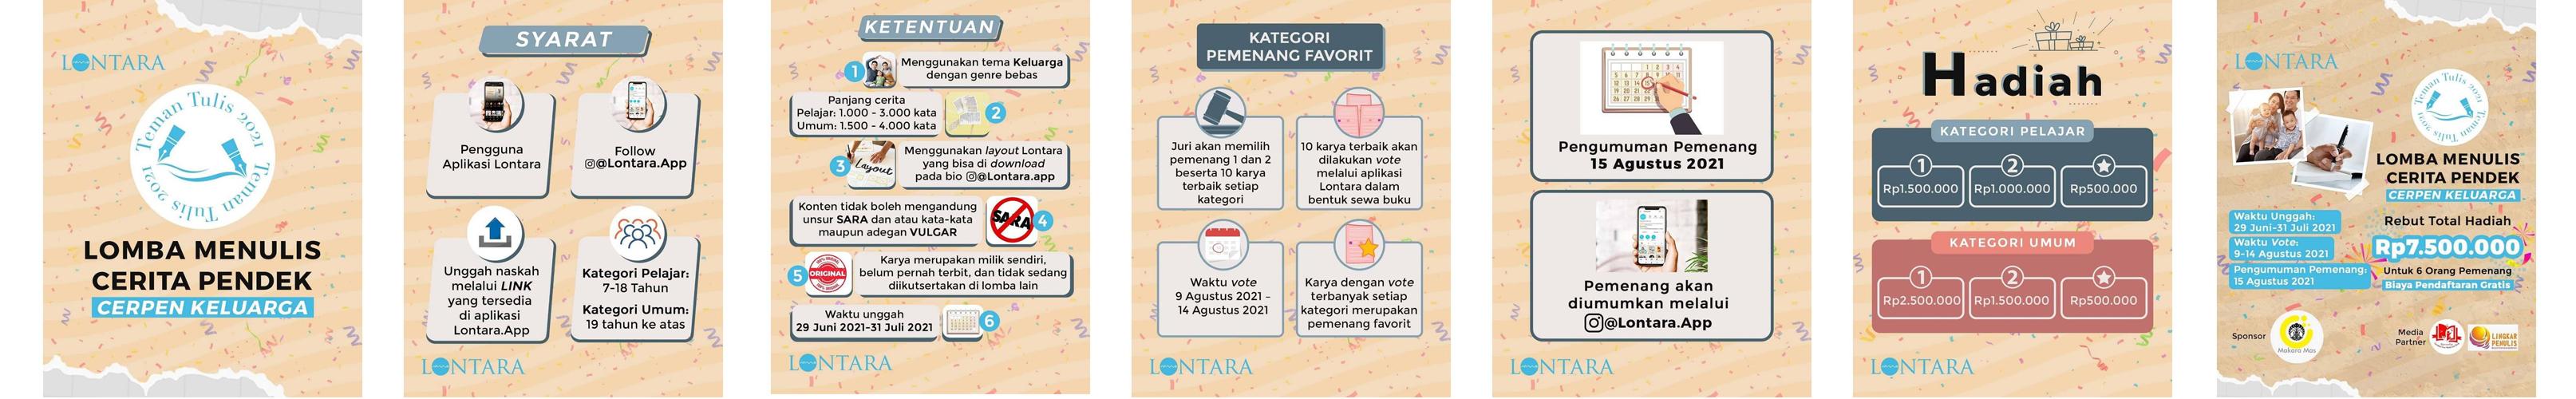 Lomba Menulis Cerpen Berhadiah Total 7,5 Juta Rupiah oleh Lontara App